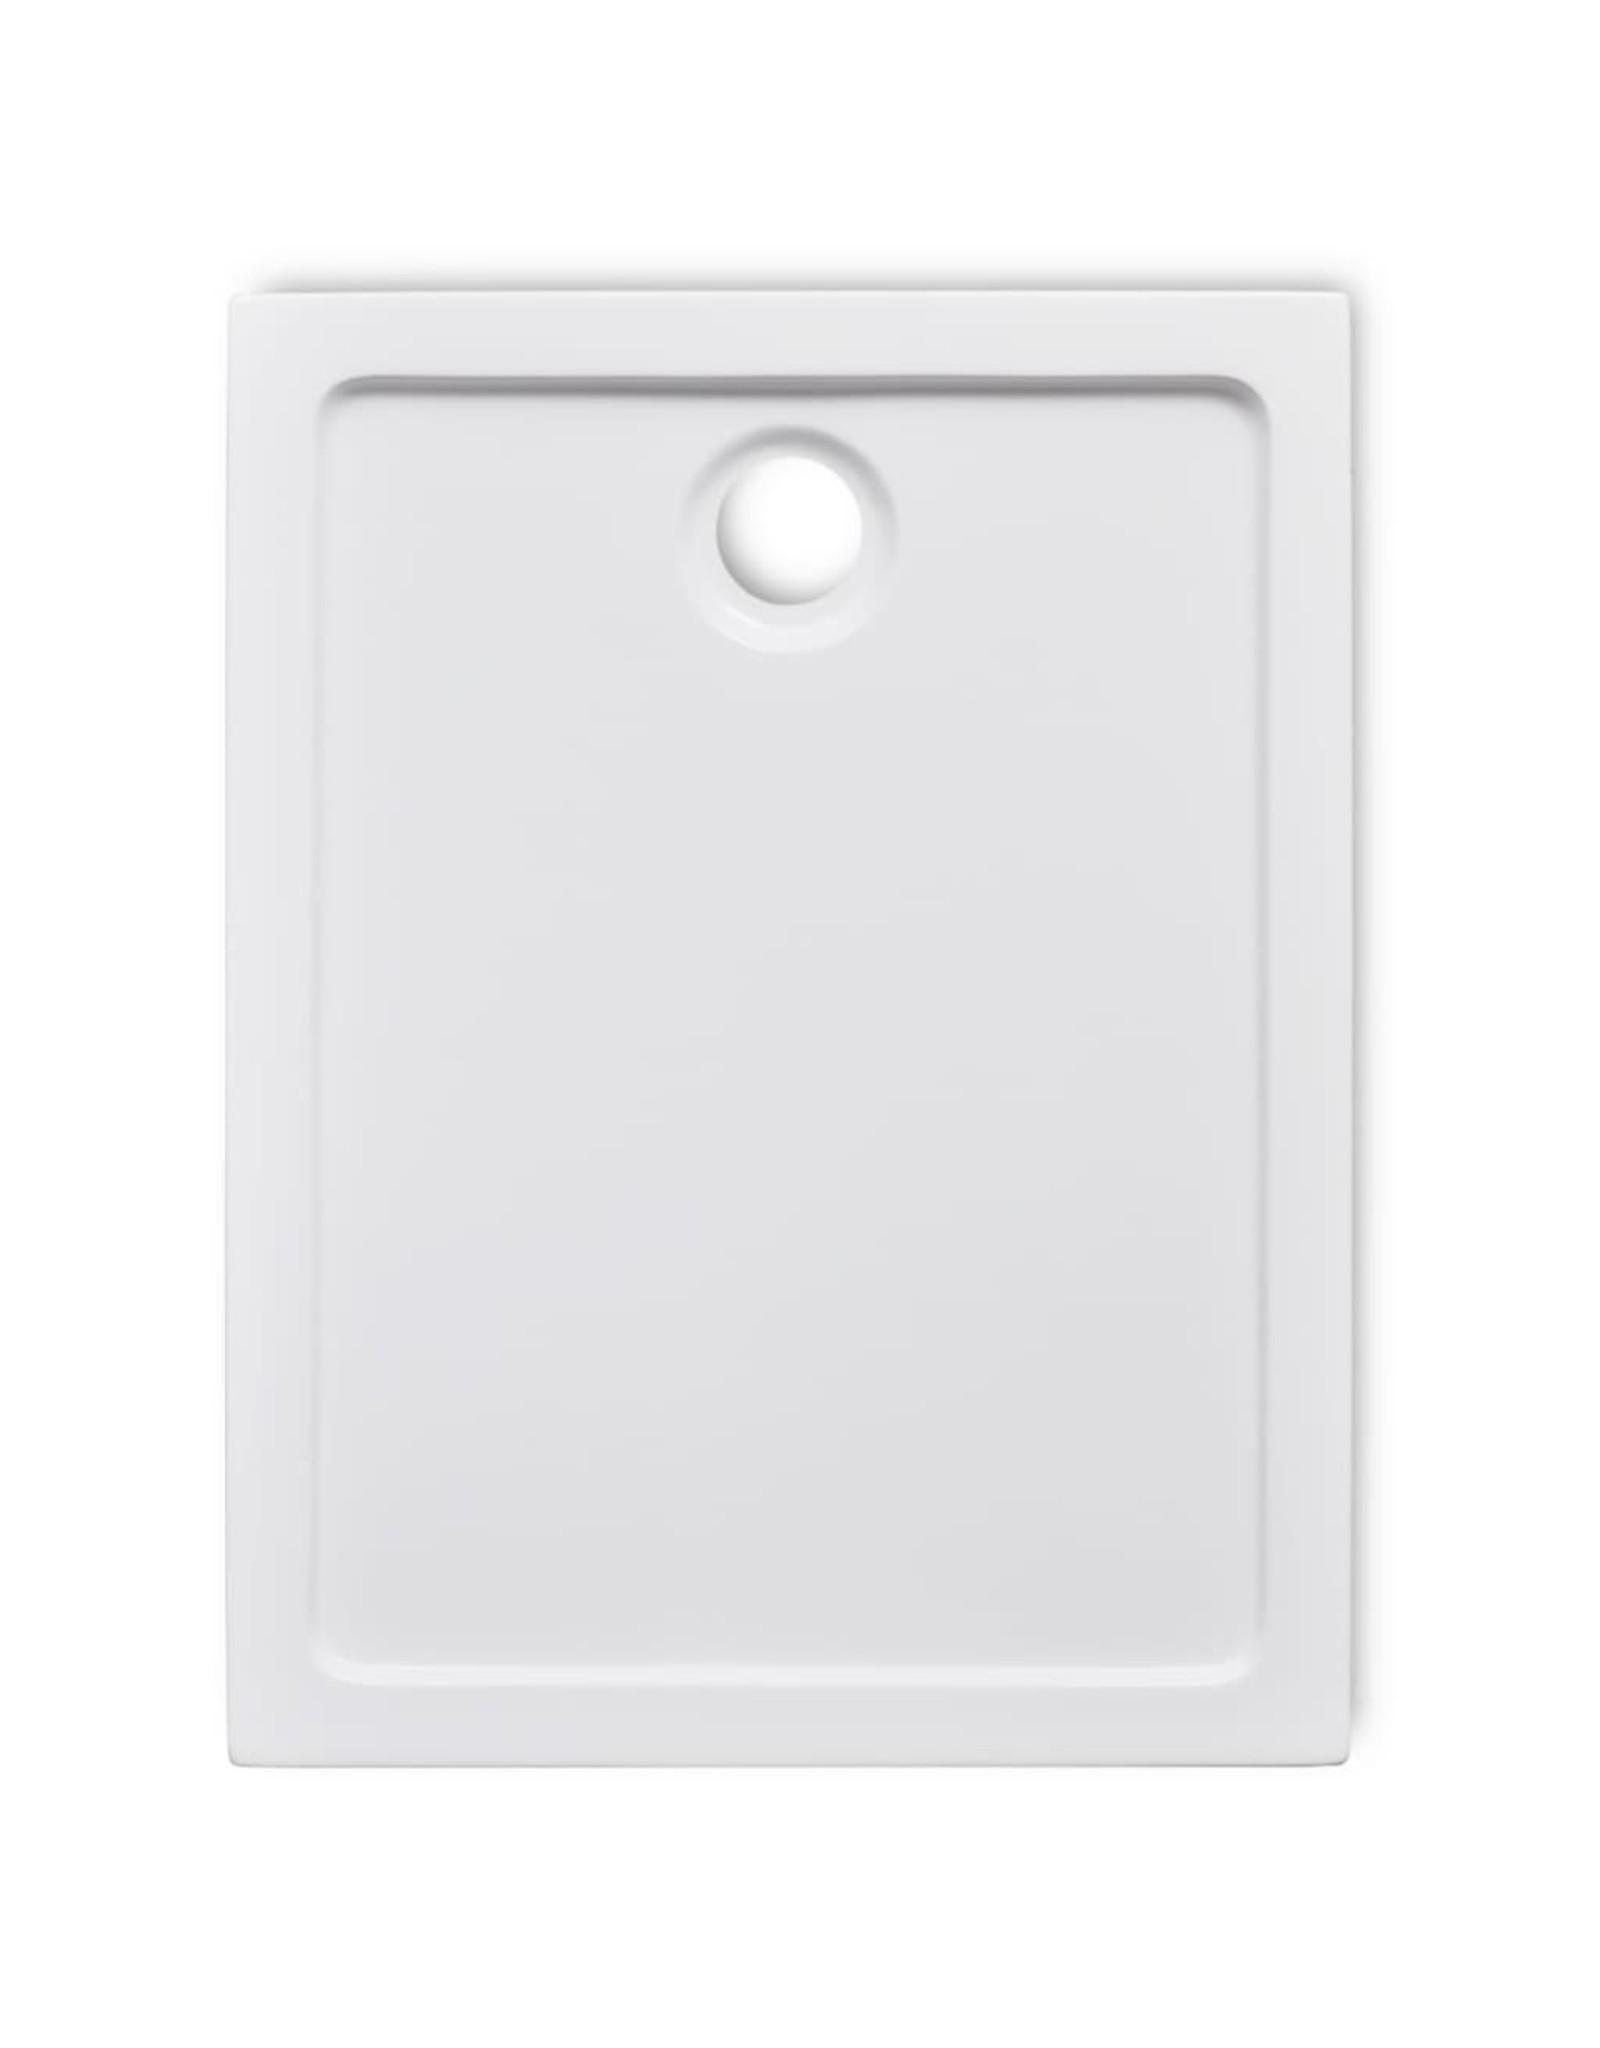 Douchebak rechthoekig 70x90 cm ABS